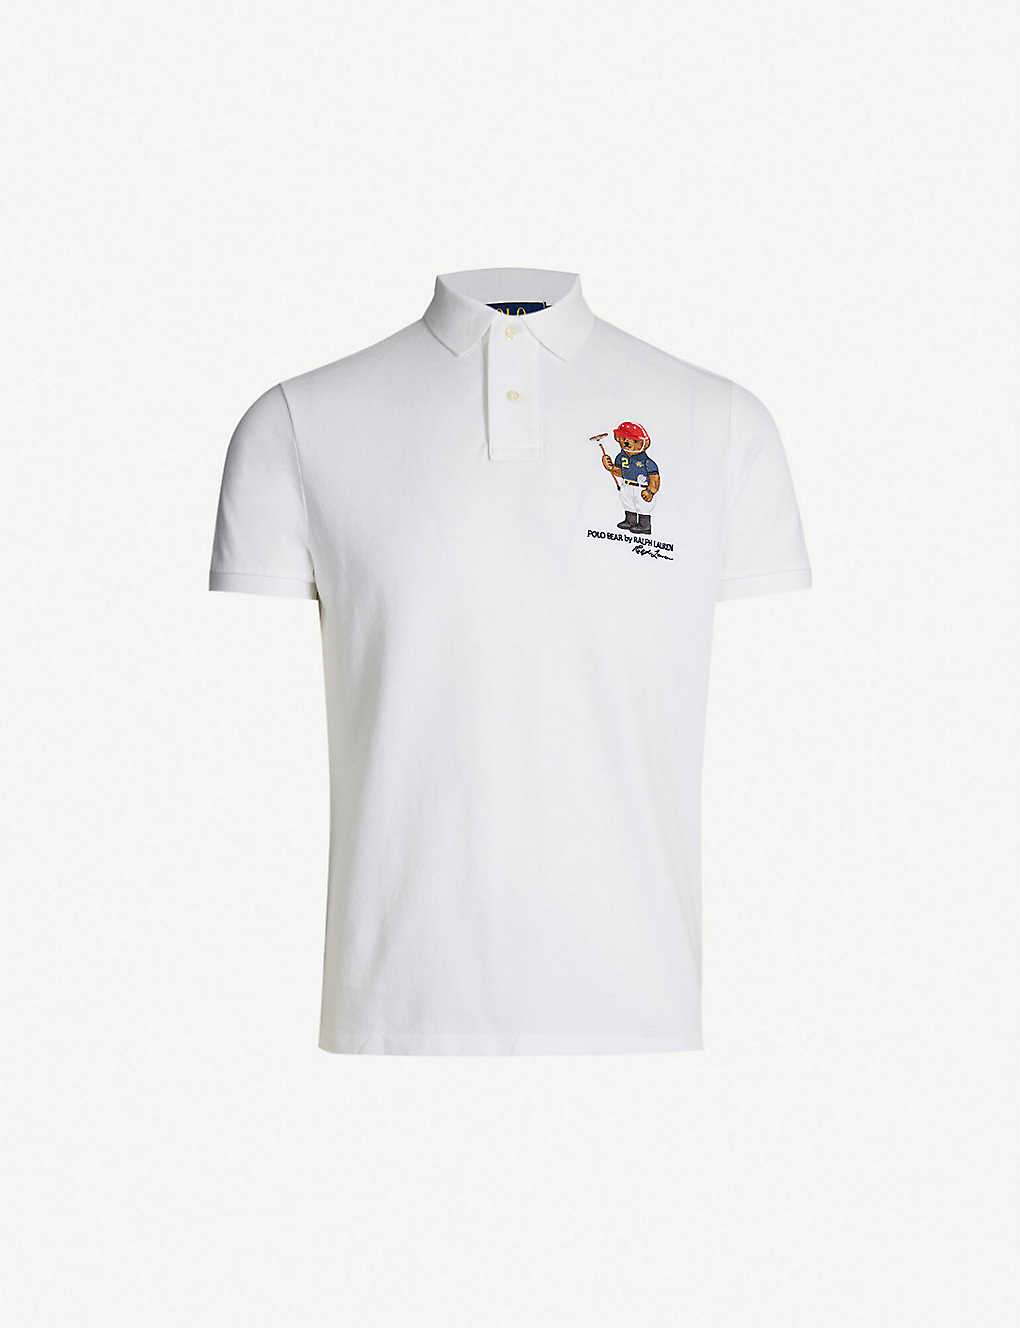 Polo Ralph Lauren Bear Embroidered Cotton Piqu Polo Shirt